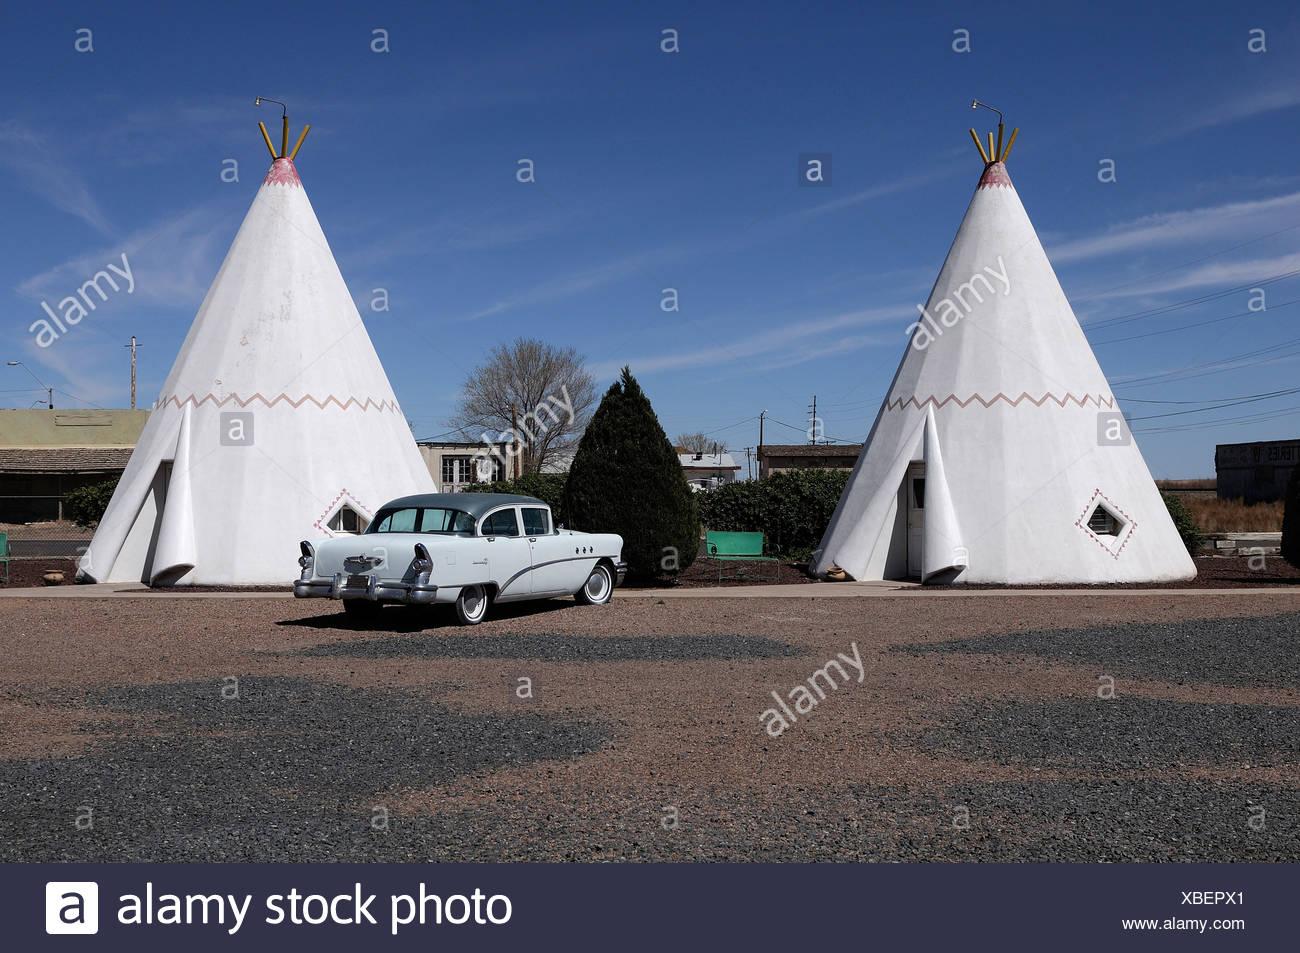 Wigwam Motel, Holbrook, Arizona, USA, United States, America, tipi, tent, car - Stock Image